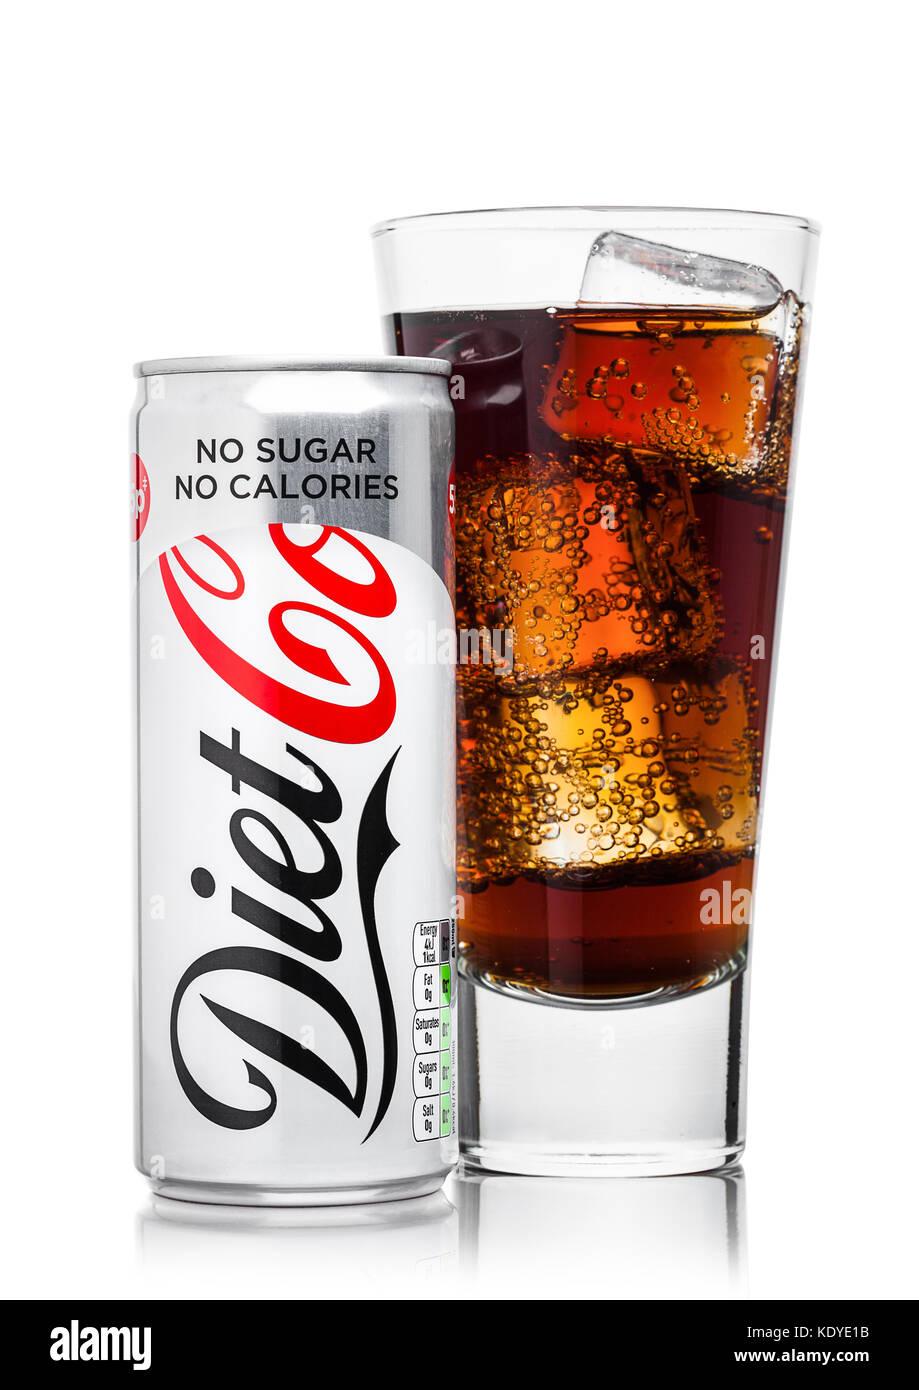 Diet Coke Glass Stock Photos & Diet Coke Glass Stock ...